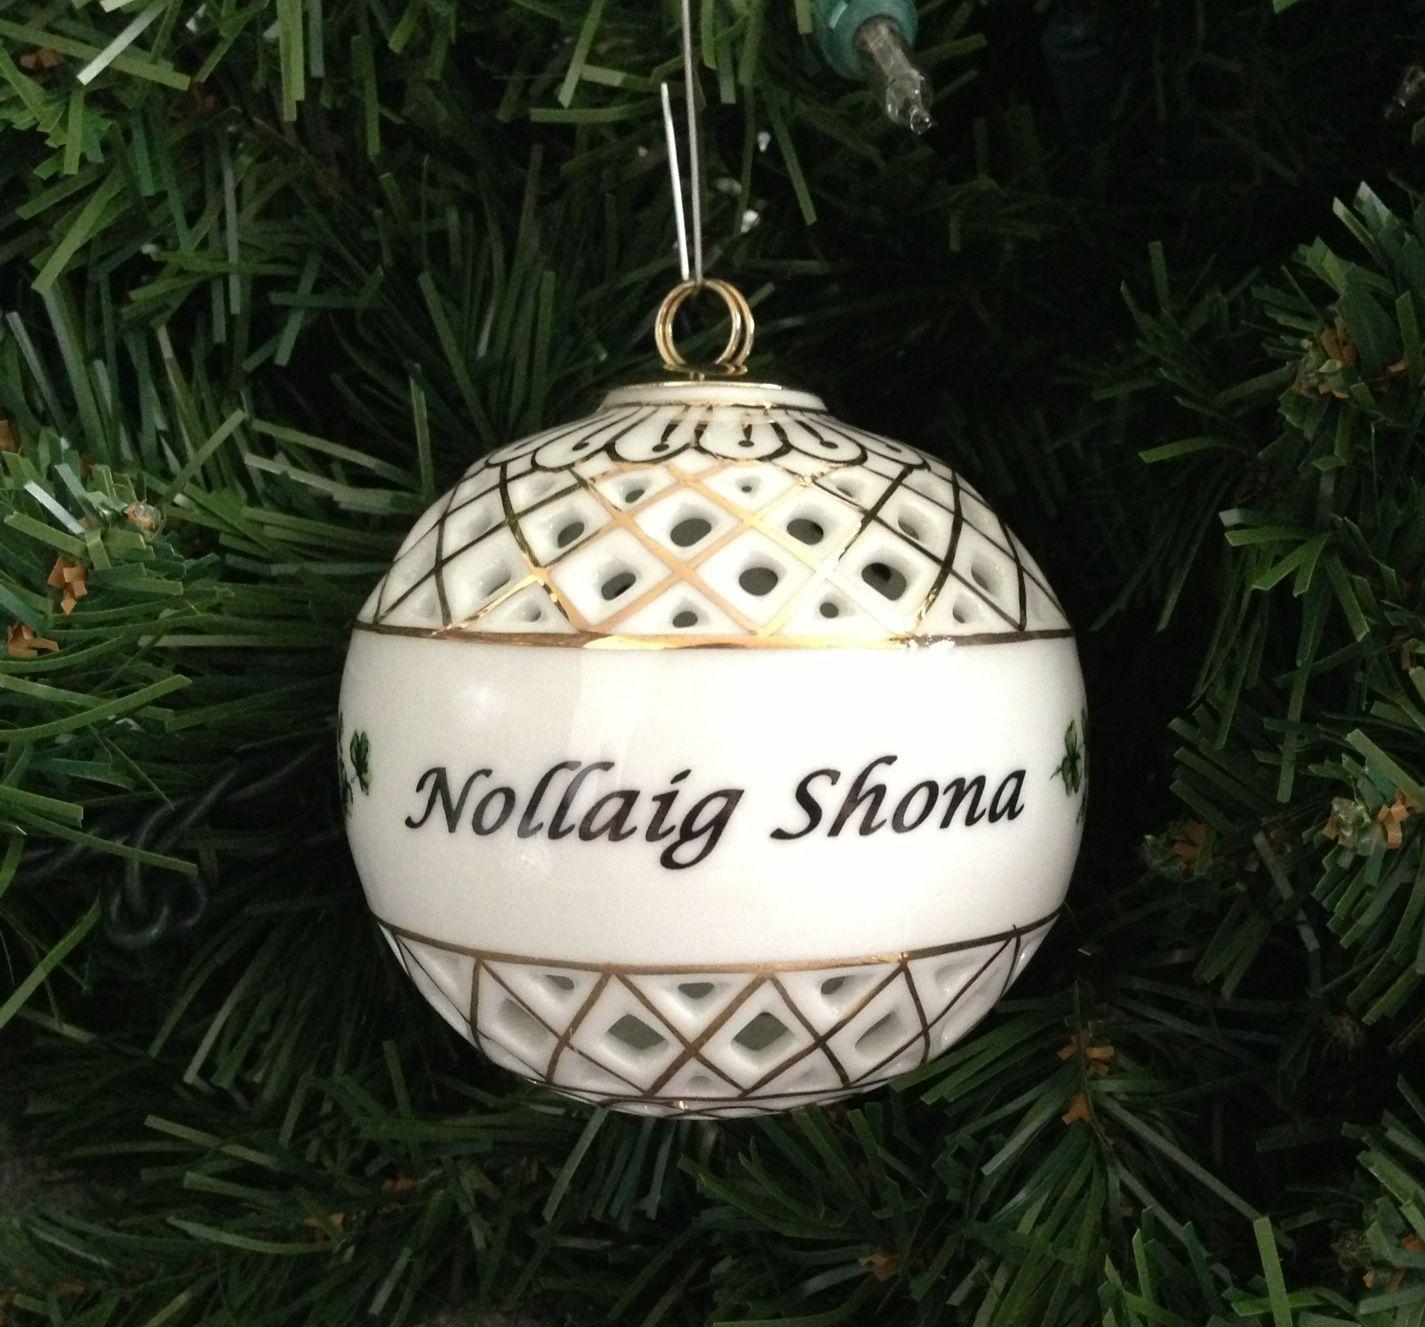 Irish Christmas Ornament Nollaig Shona Ball Ornament Irish Christmas Christmas Ornaments Irish Christmas Gifts